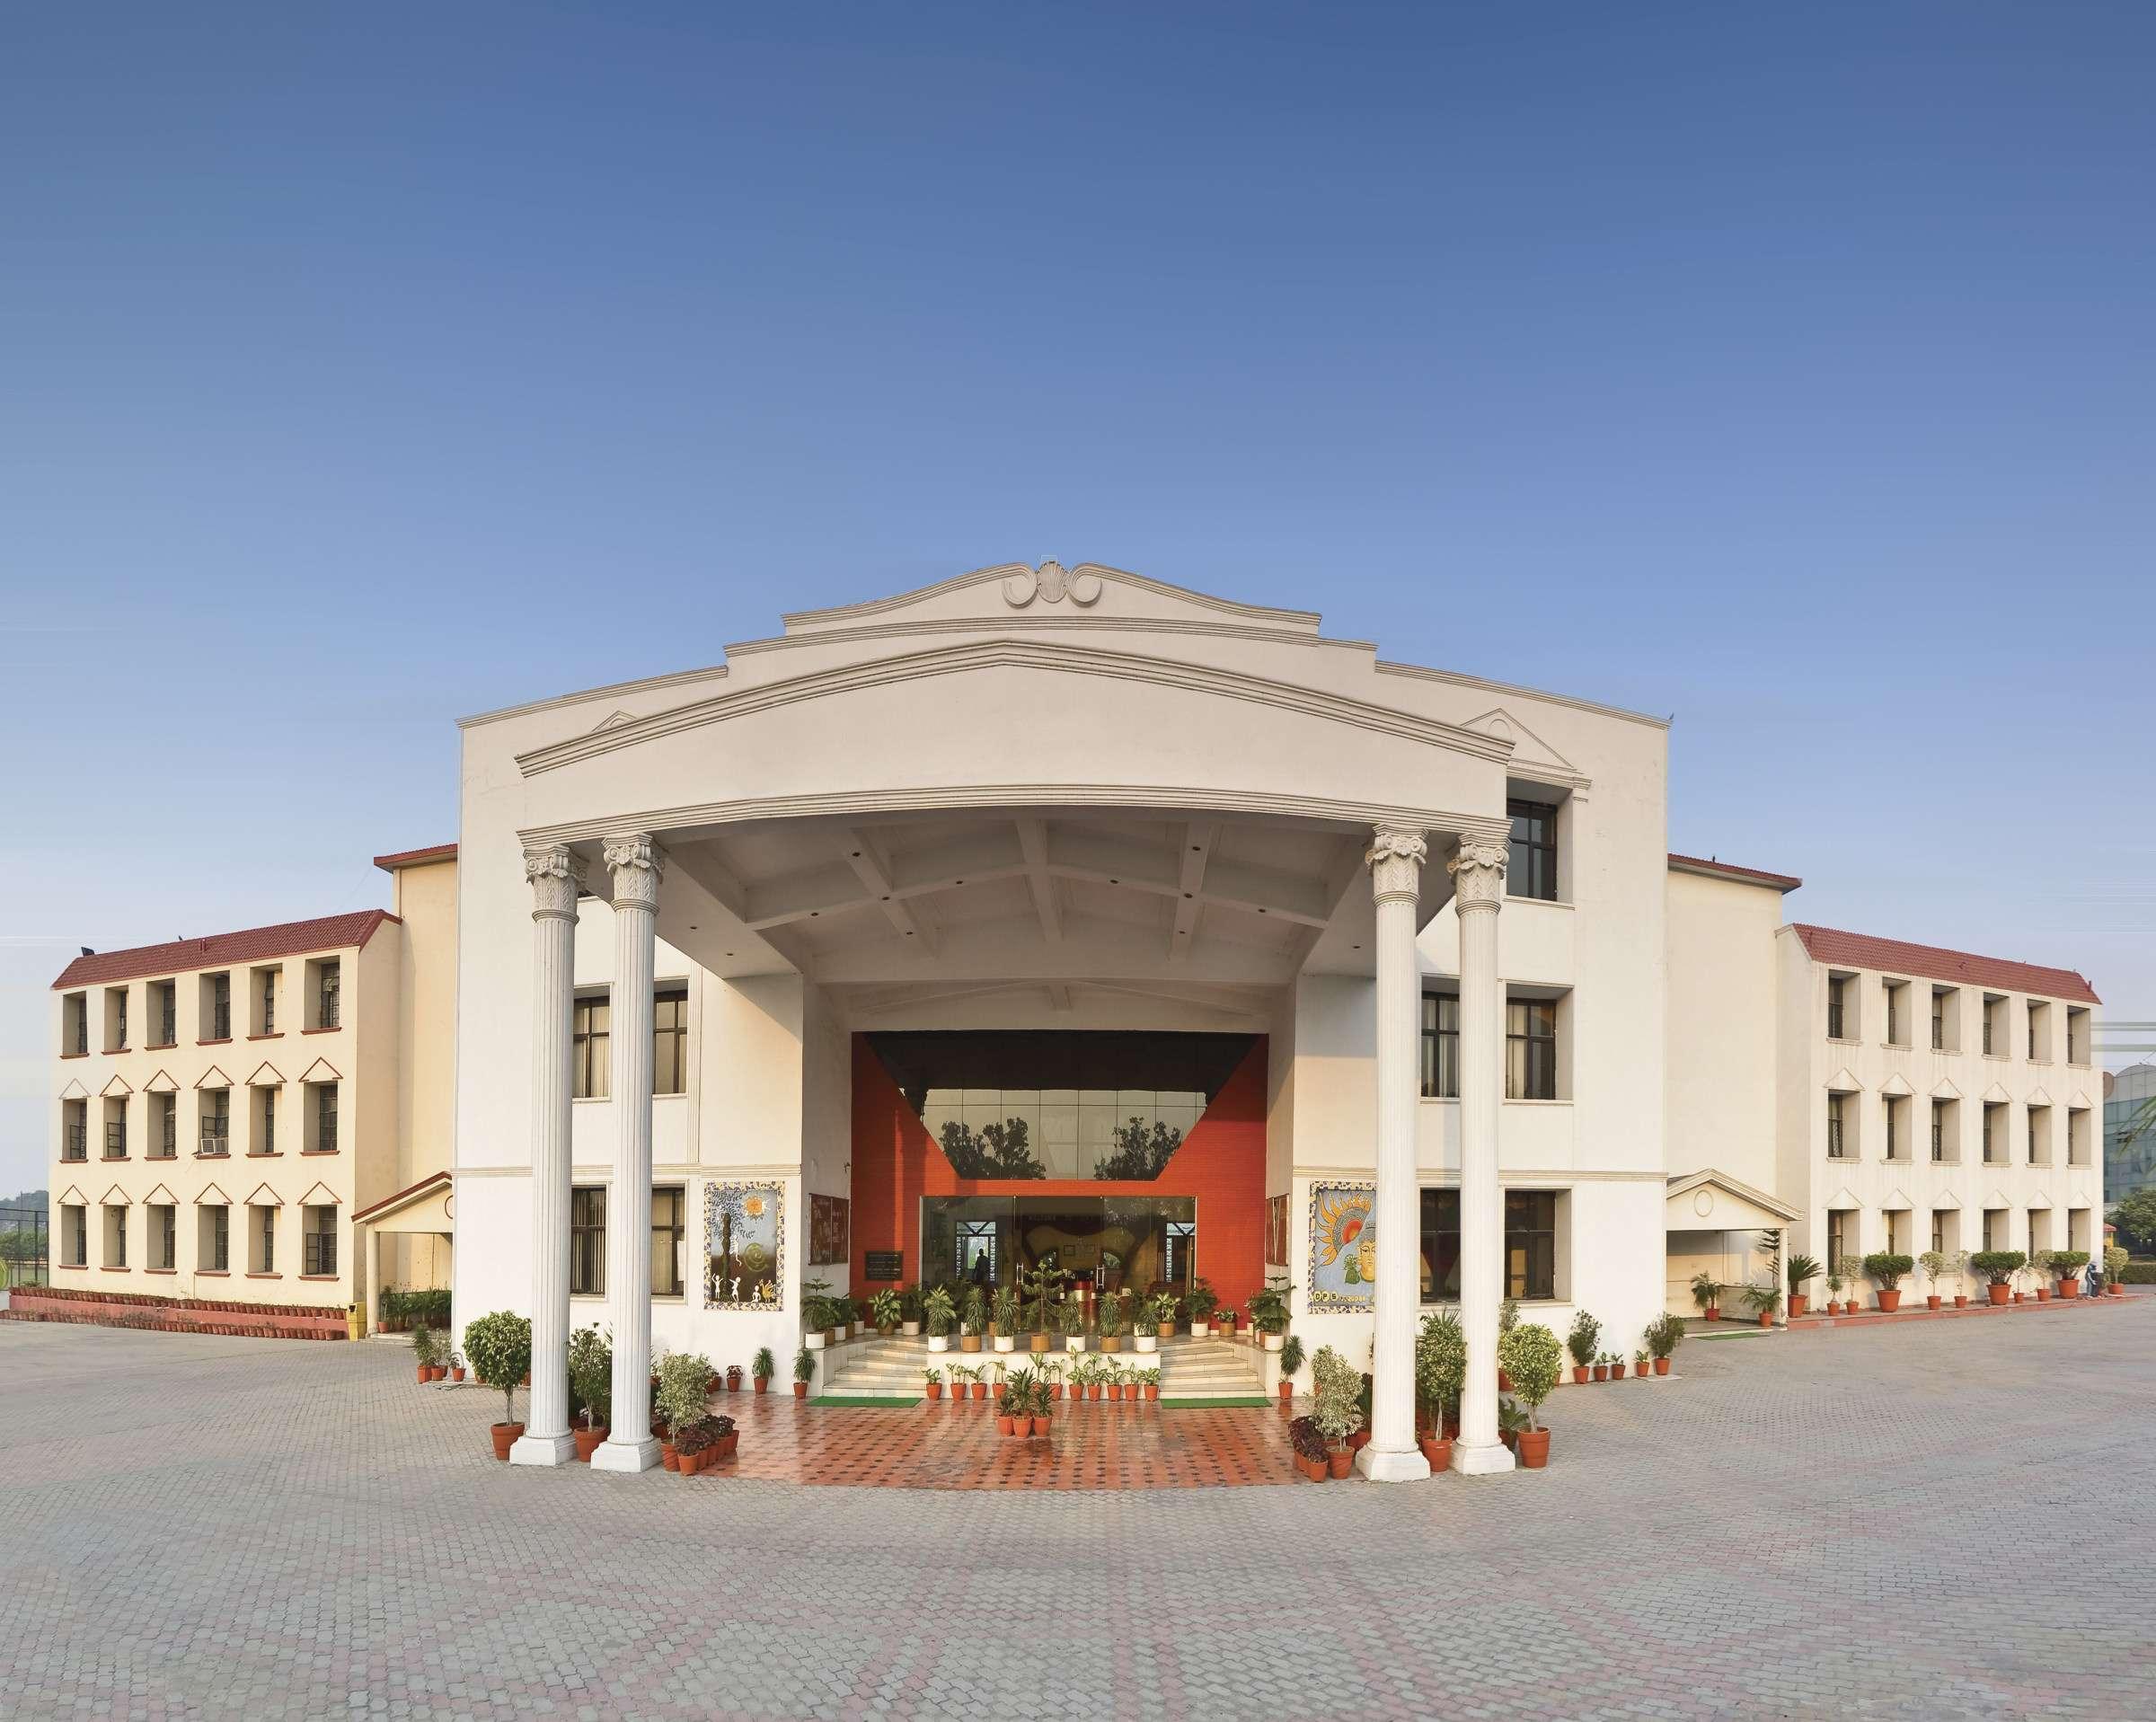 DELHI PUBLIC SCHOOL 77 MILE STONE G T ROAD VILL KARHANS PANIPAT HARYANA 530464